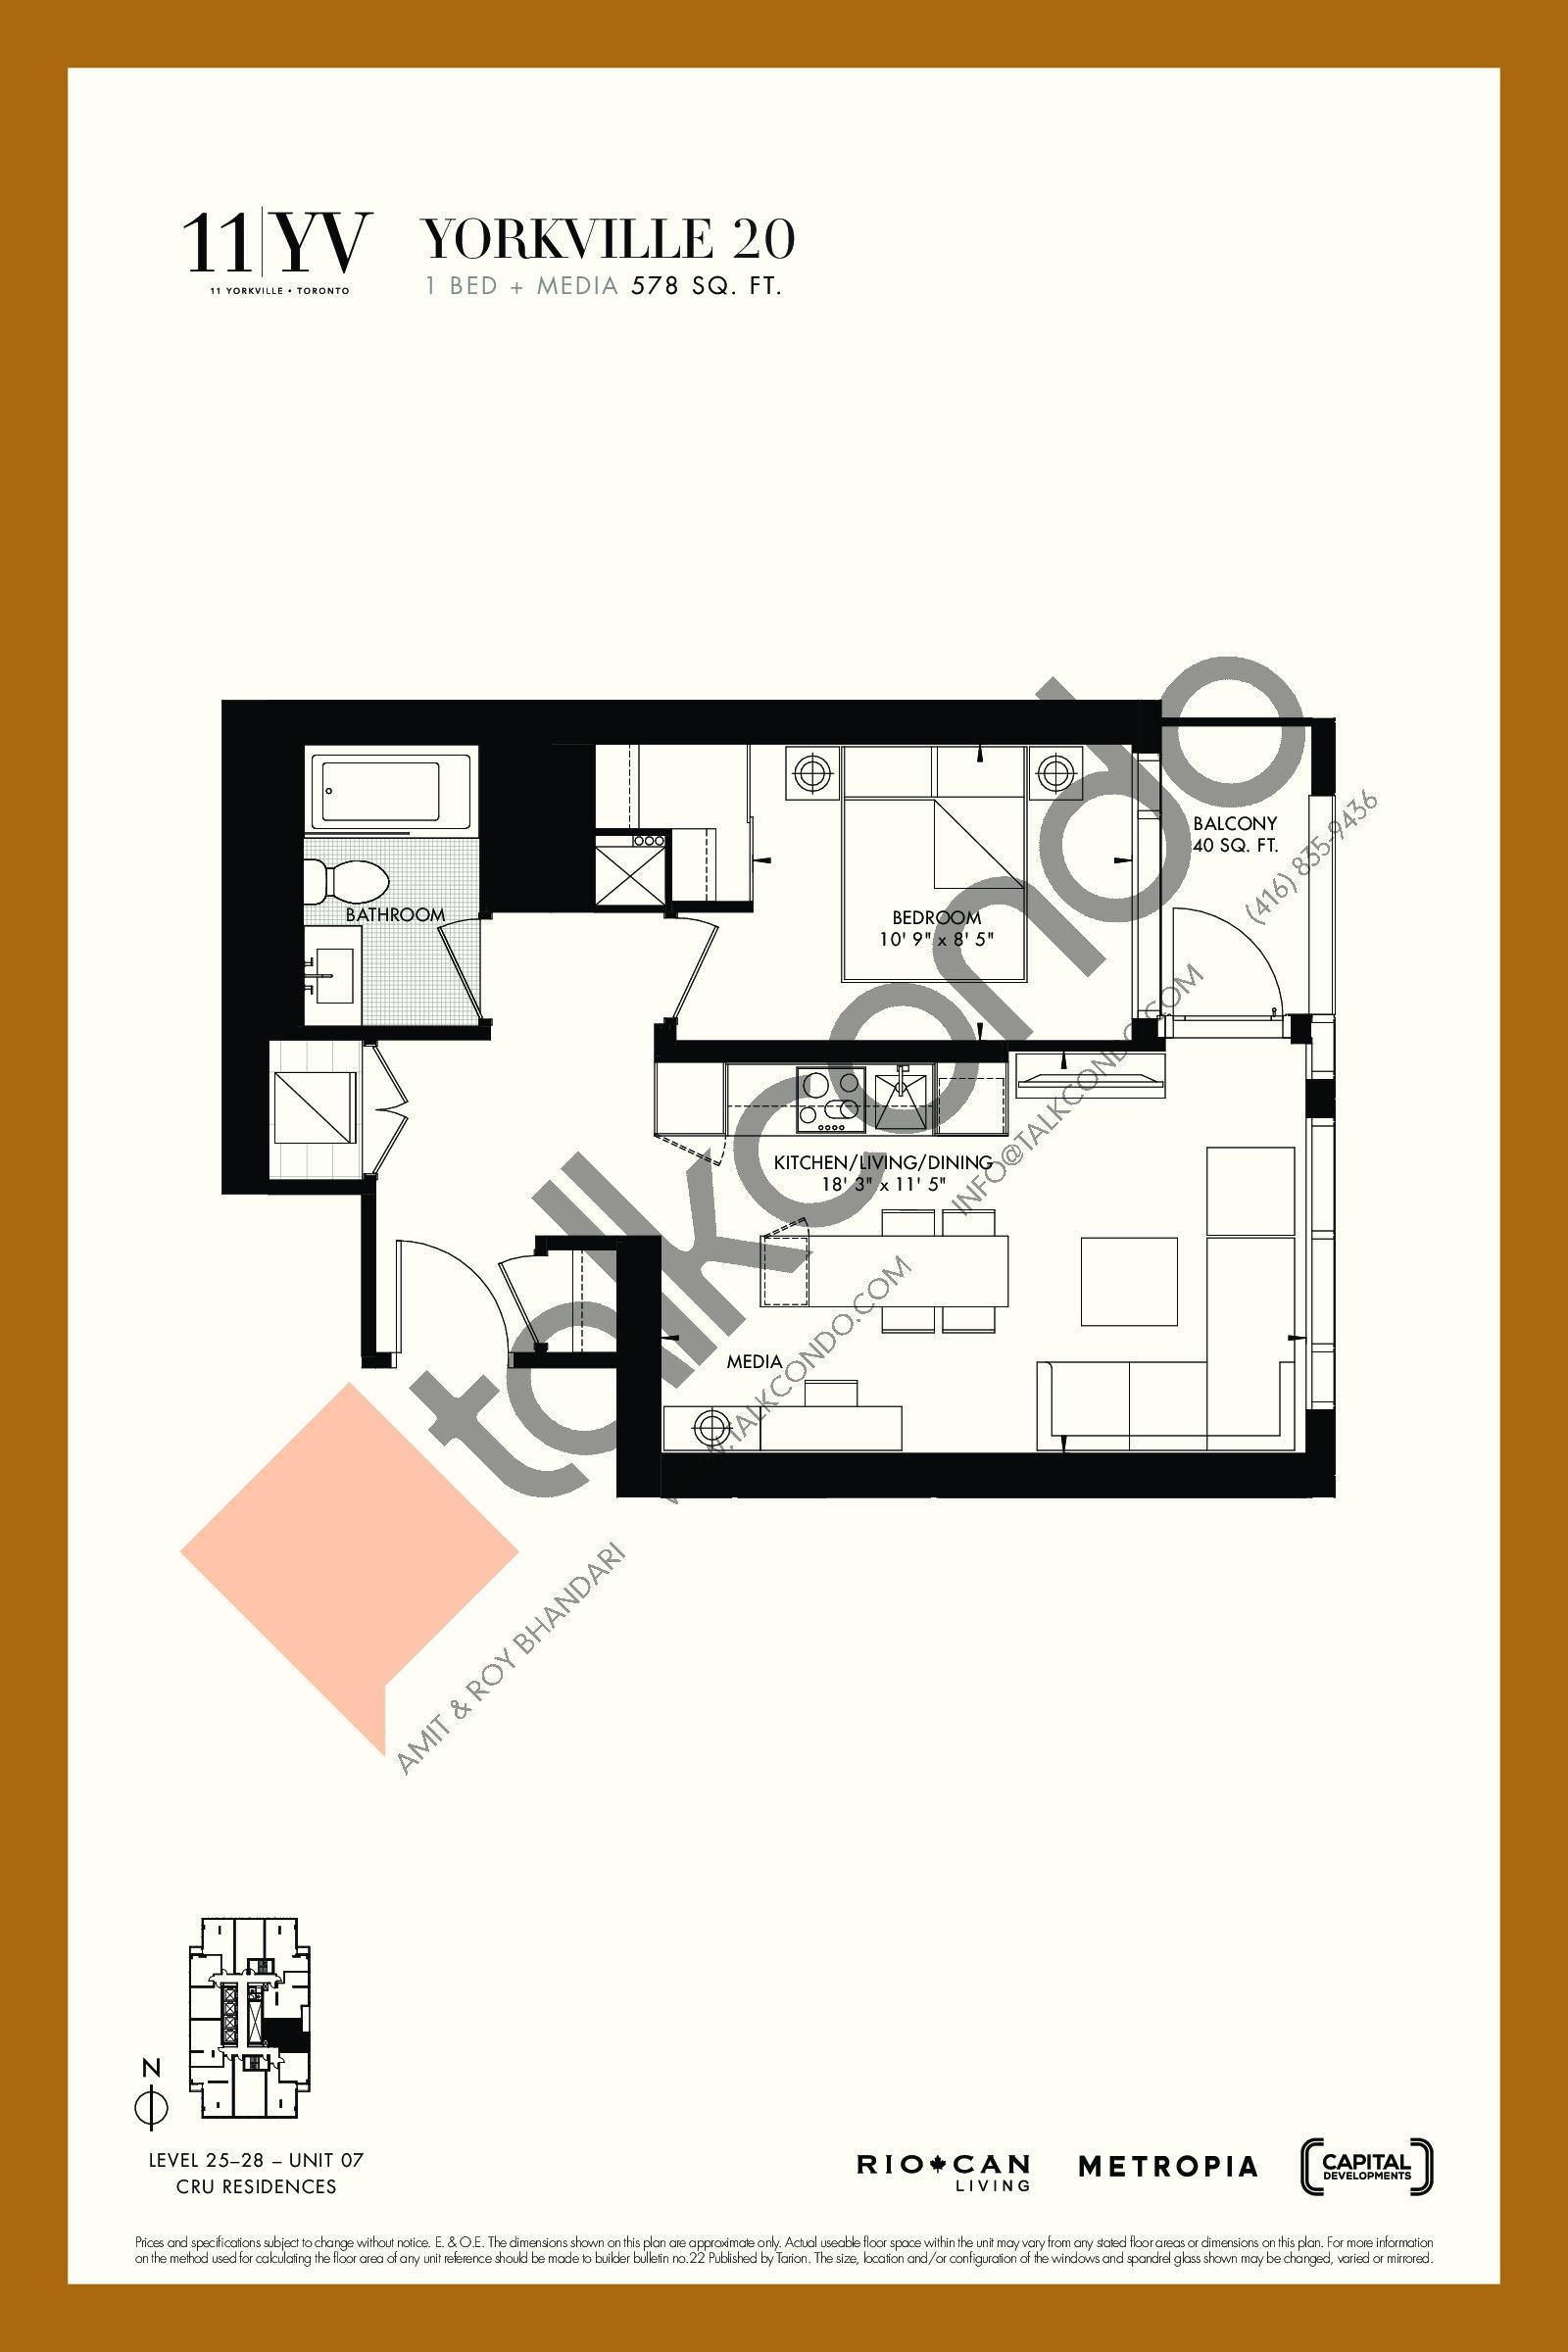 Yorkville 20 Floor Plan at 11YV Condos - 578 sq.ft